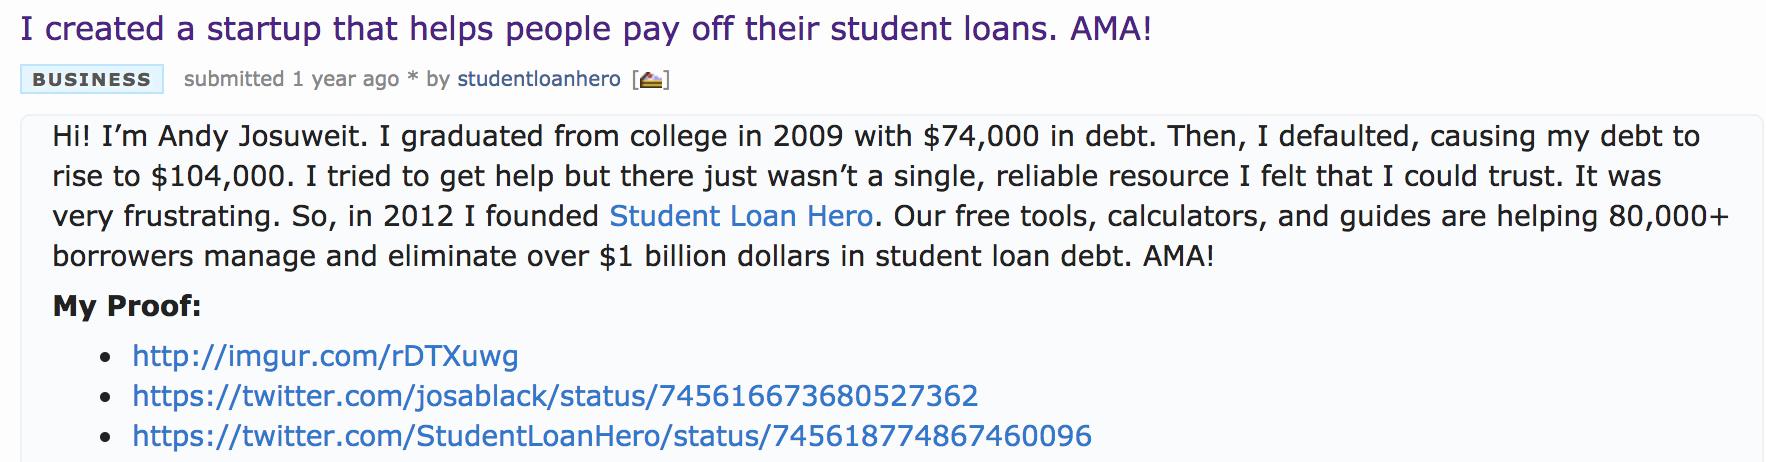 student loan hero reddit AMA one way to get web traffic